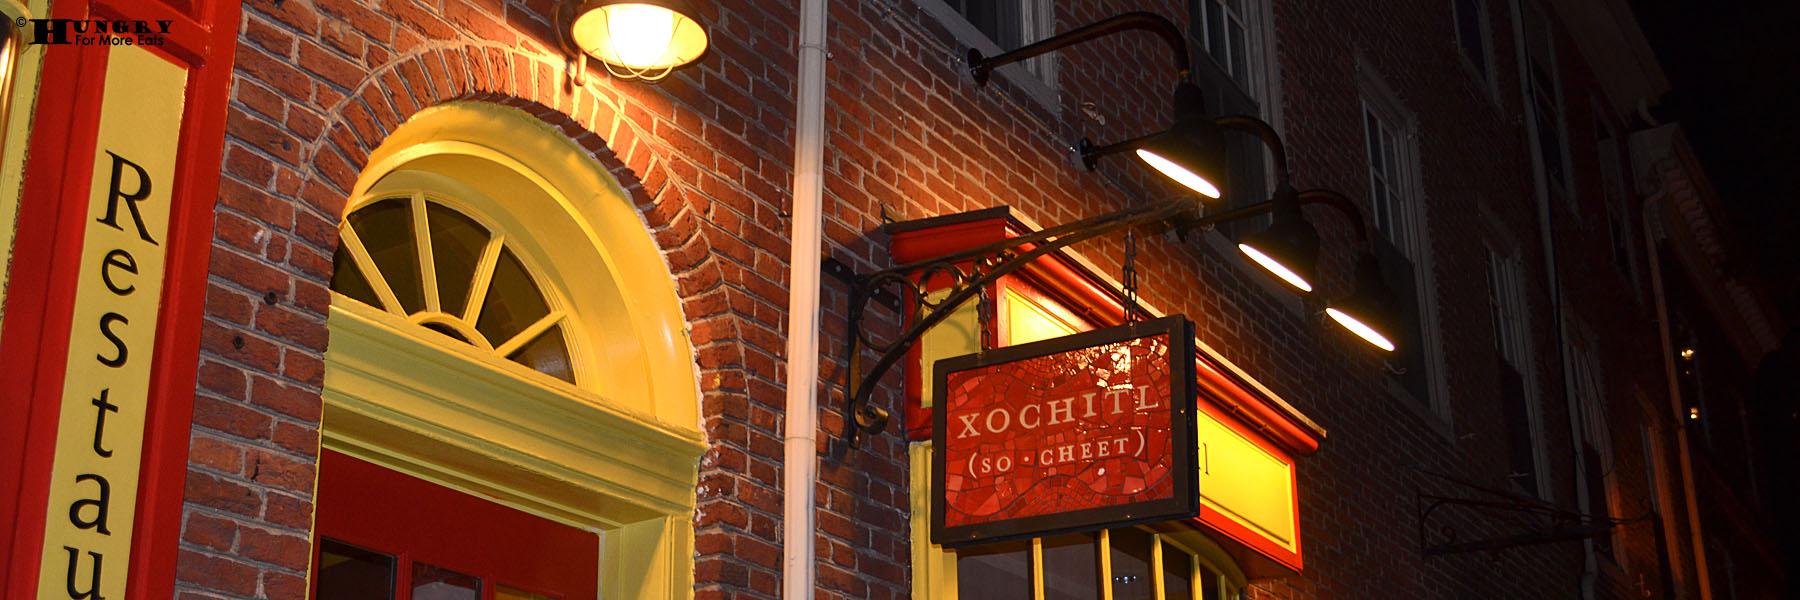 Xochitl, Philadelphia